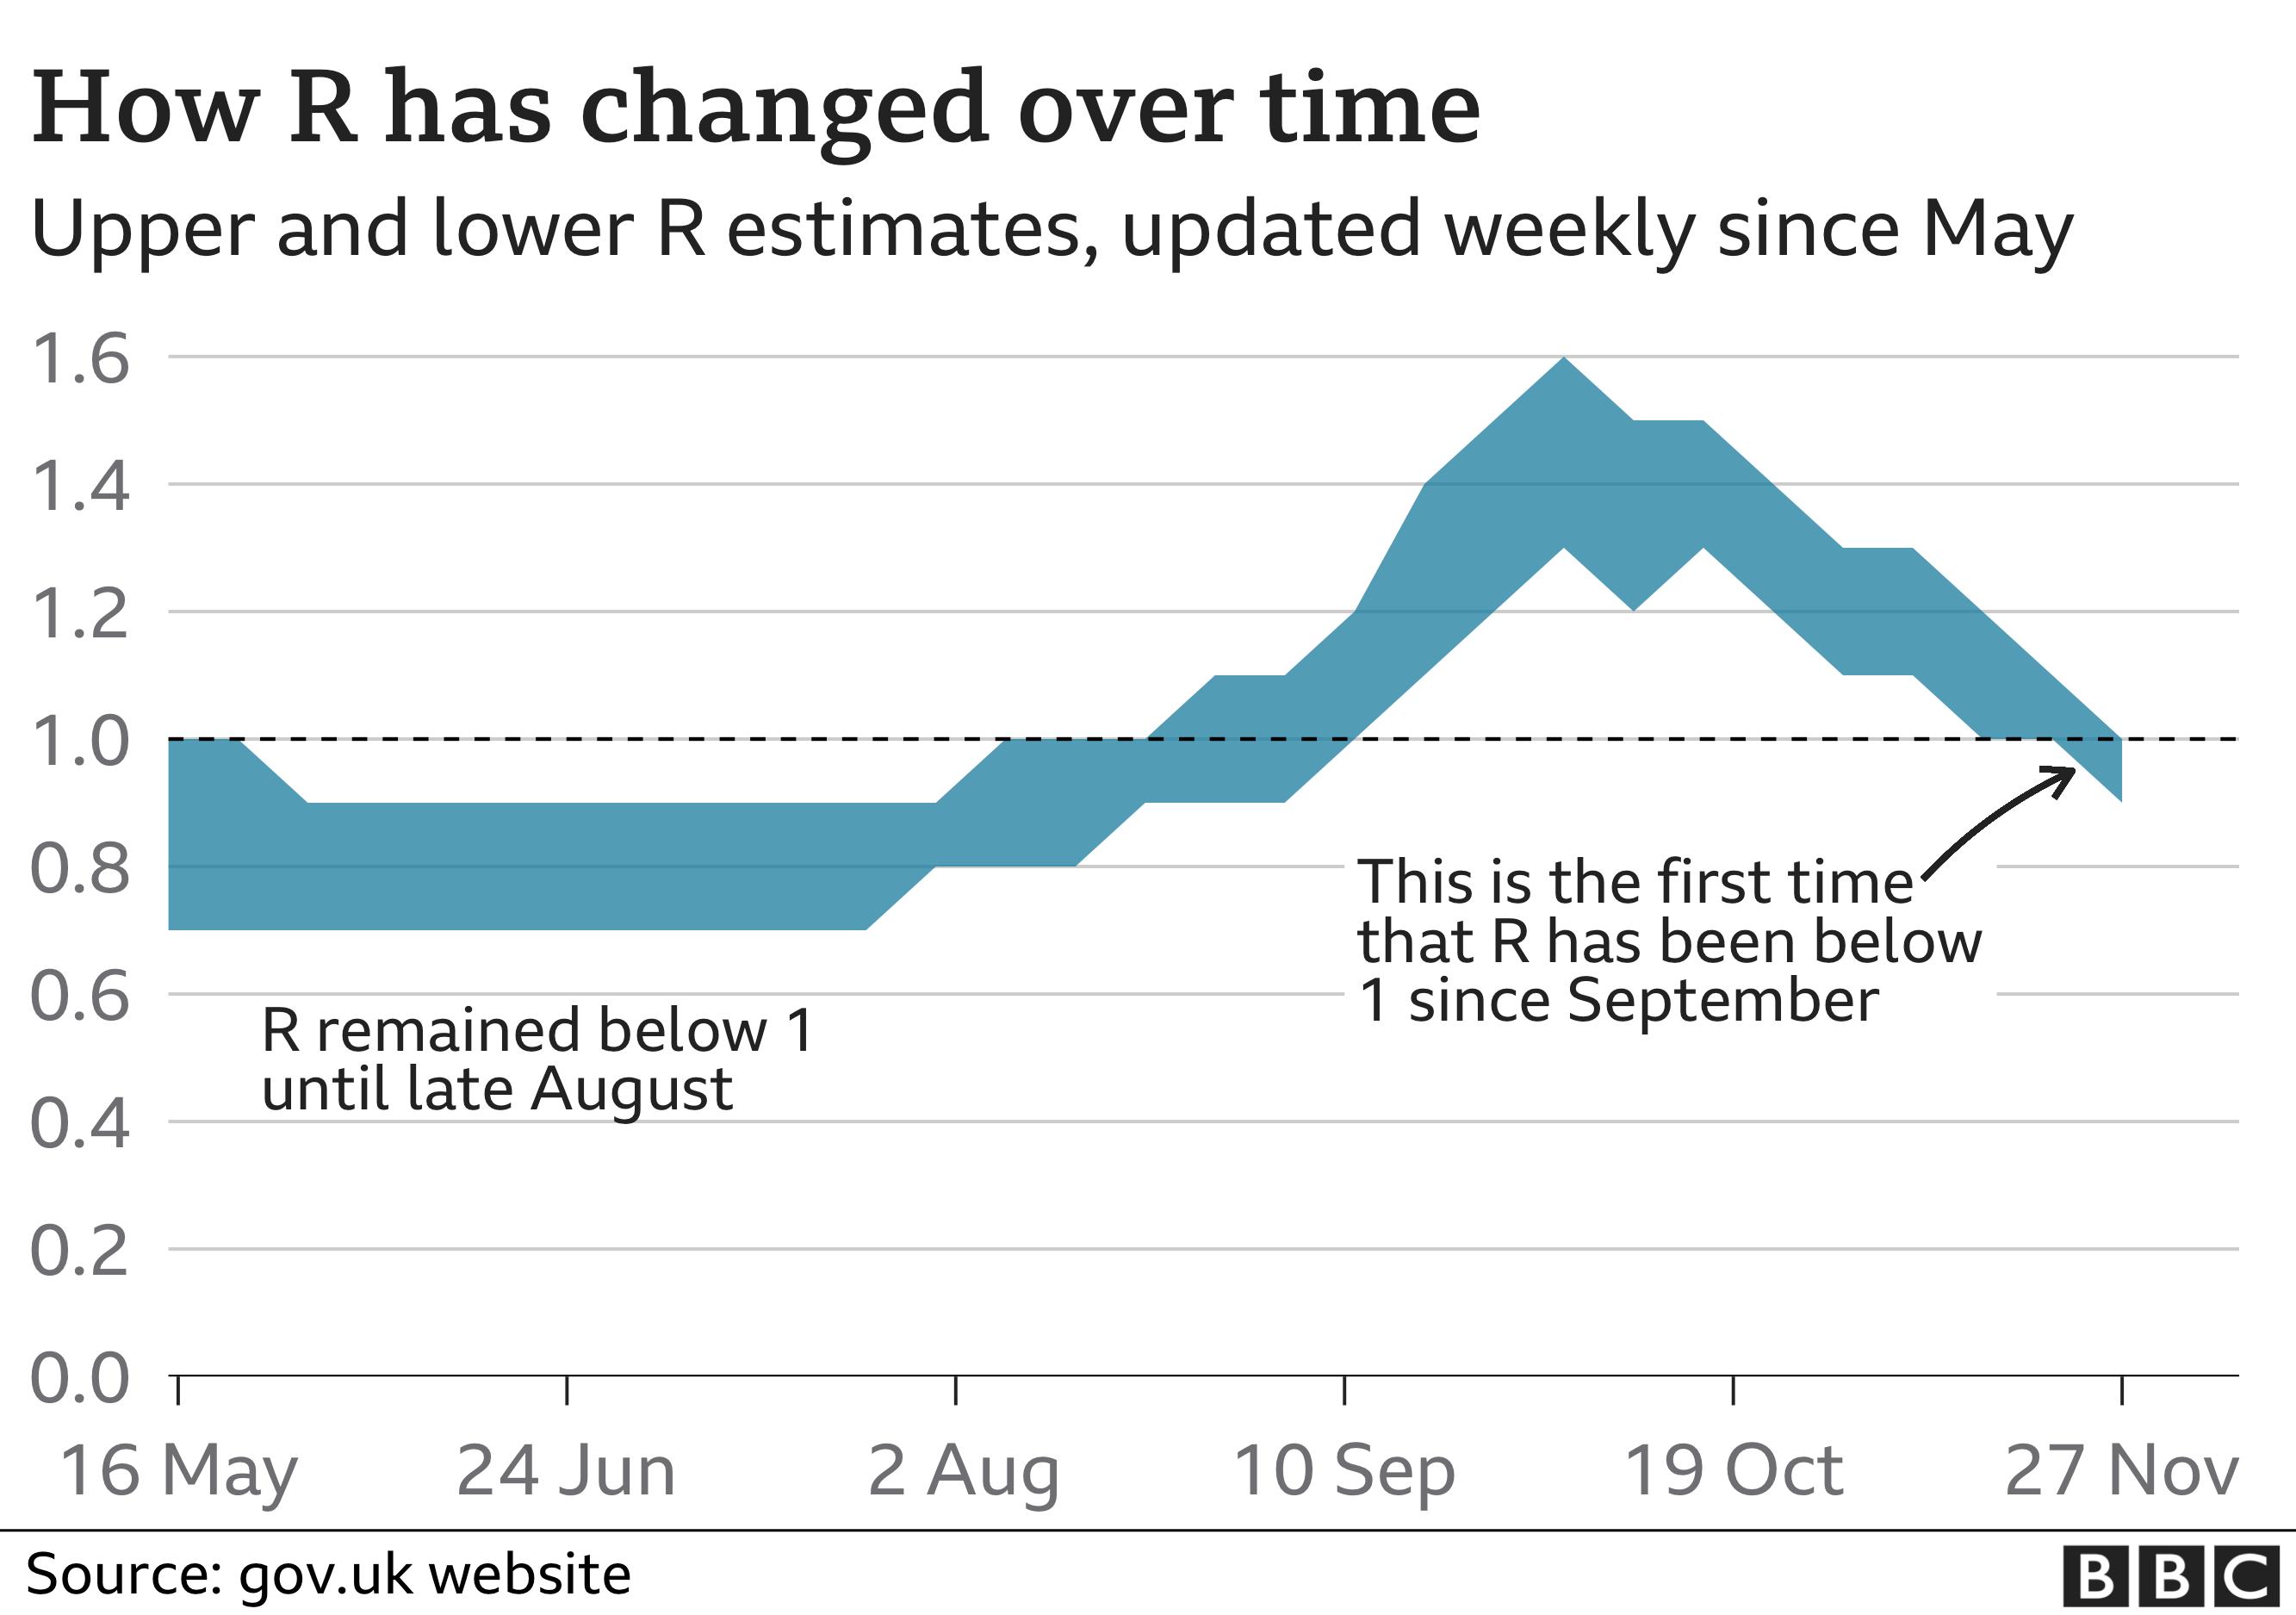 R was last below 1 on the 14 August